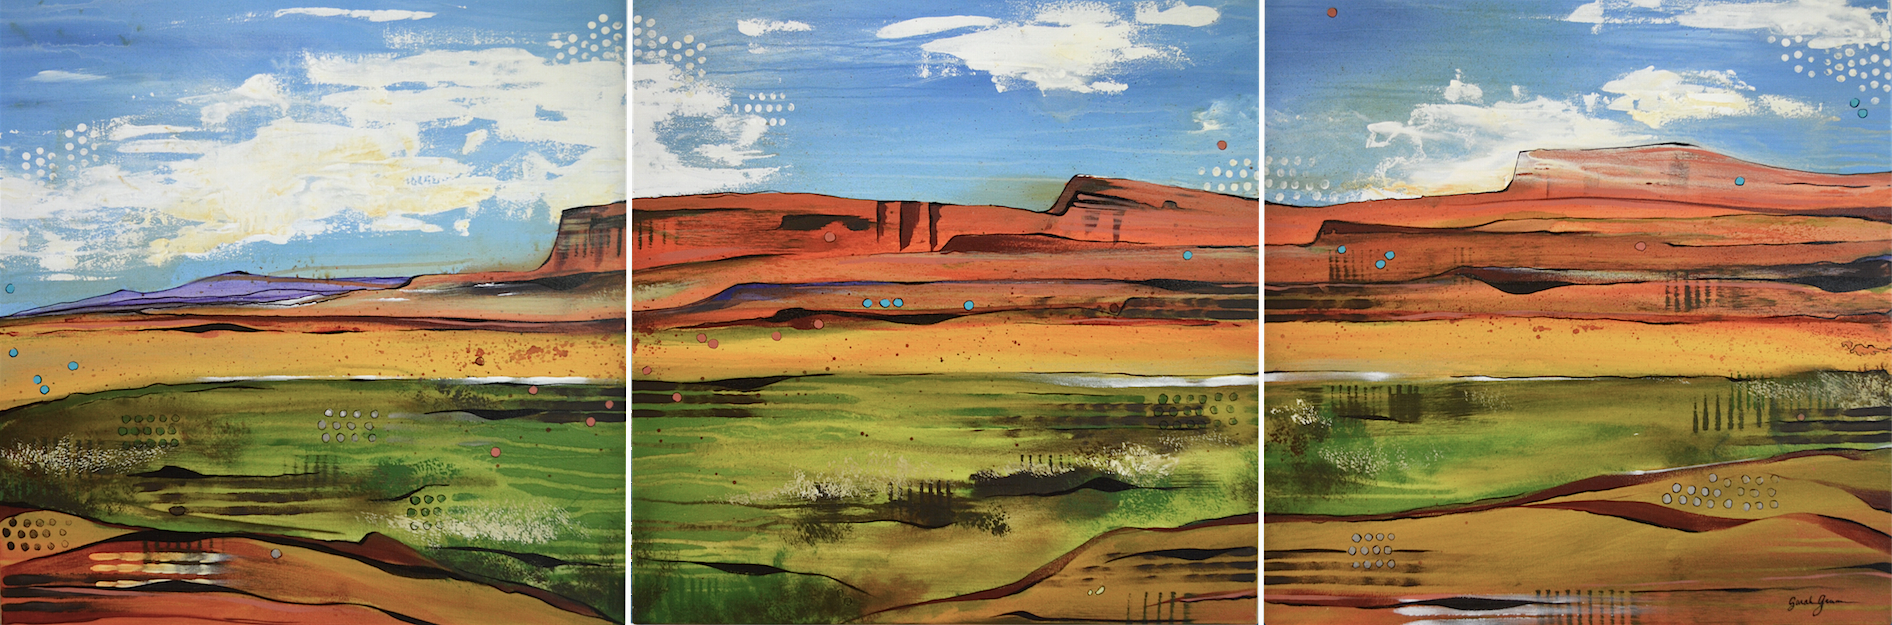 Navajoland.png